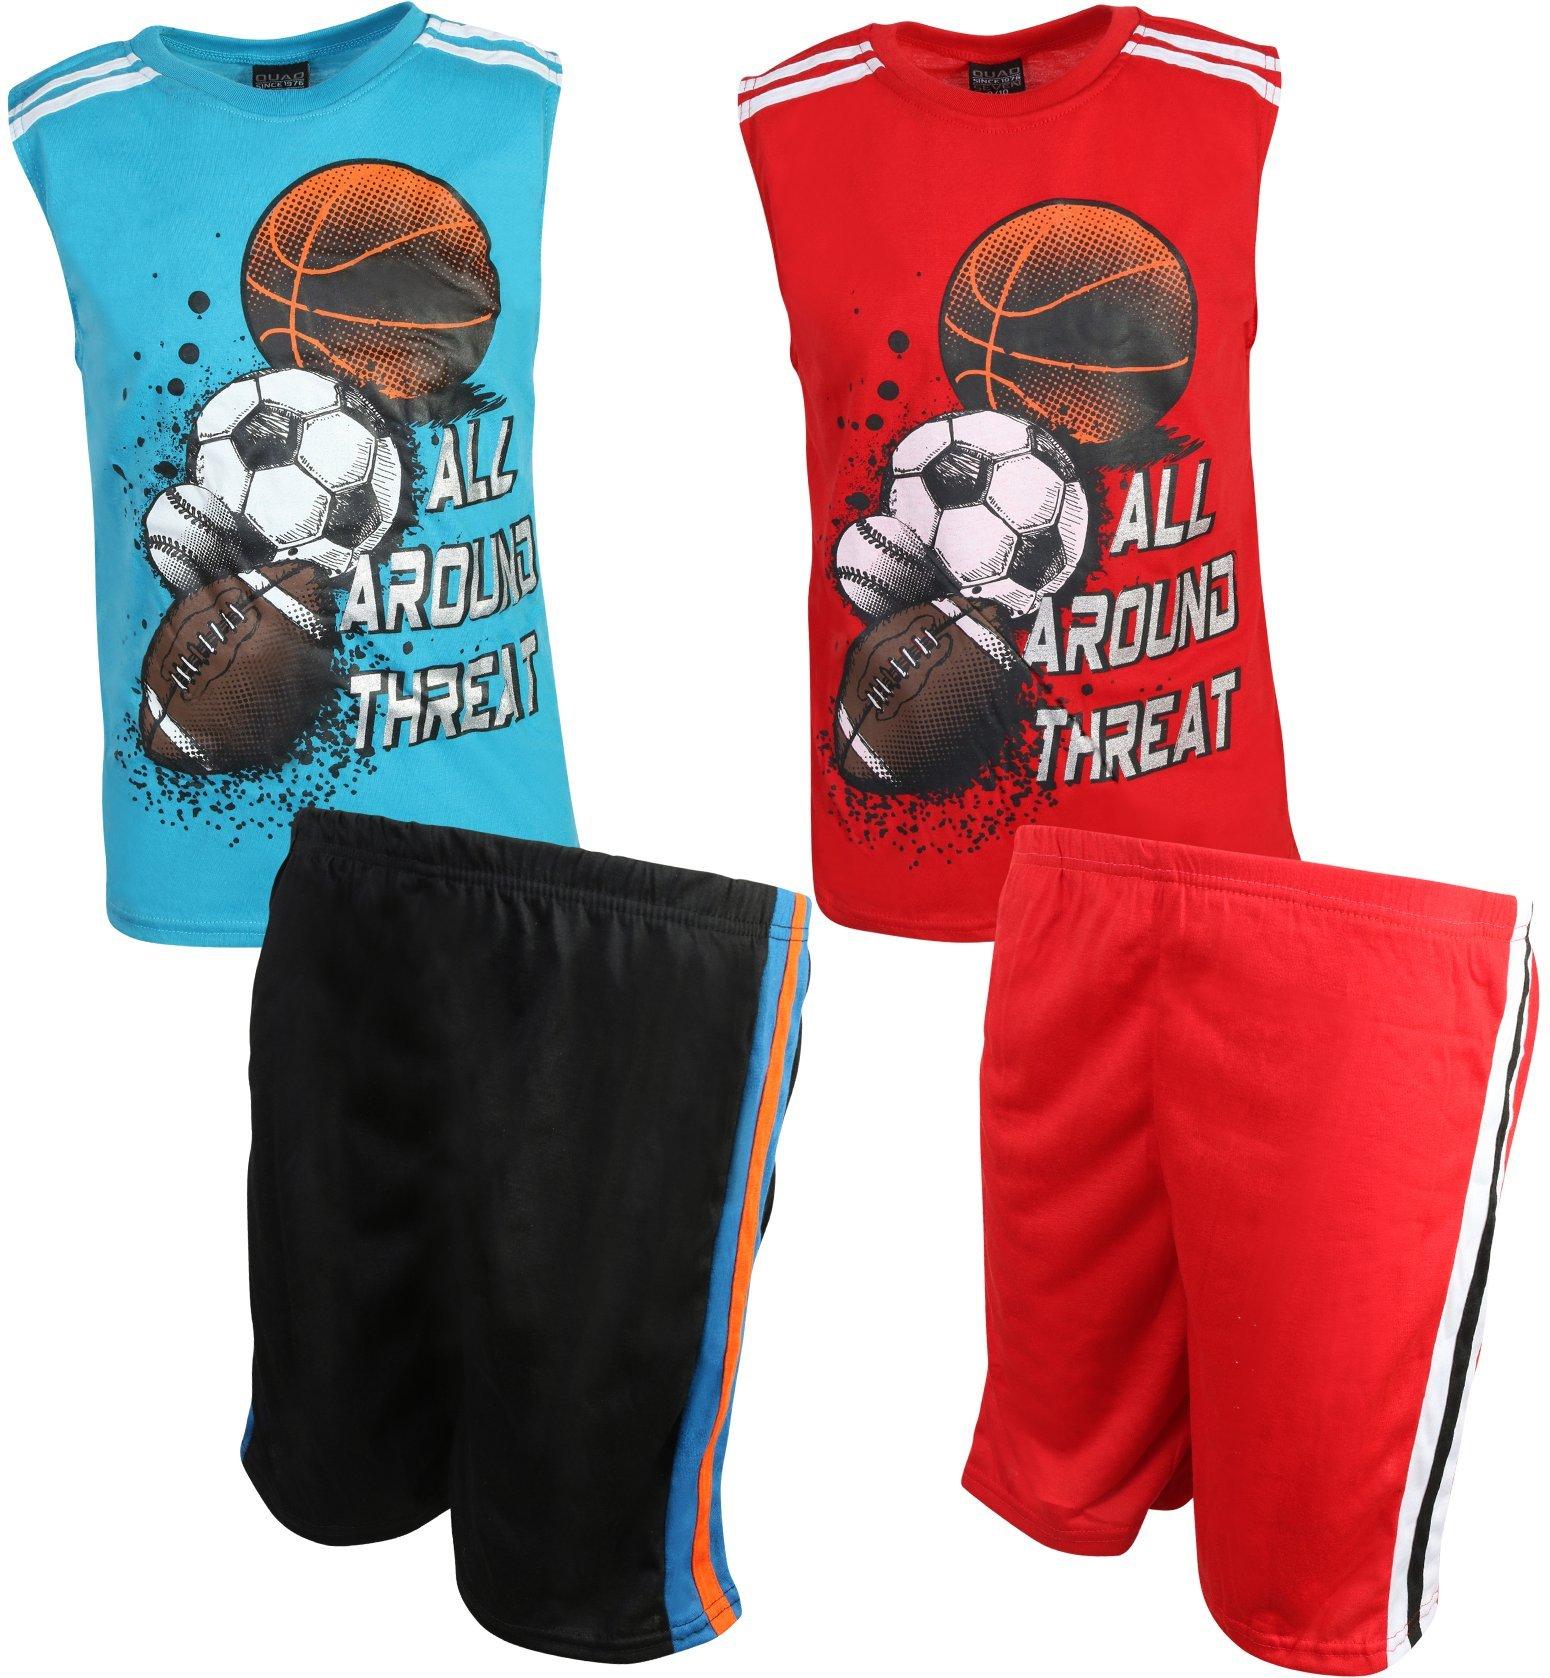 Quad Seven Boy's 4-Piece Pajama Short Set, All Around Threat, Size 16/18'